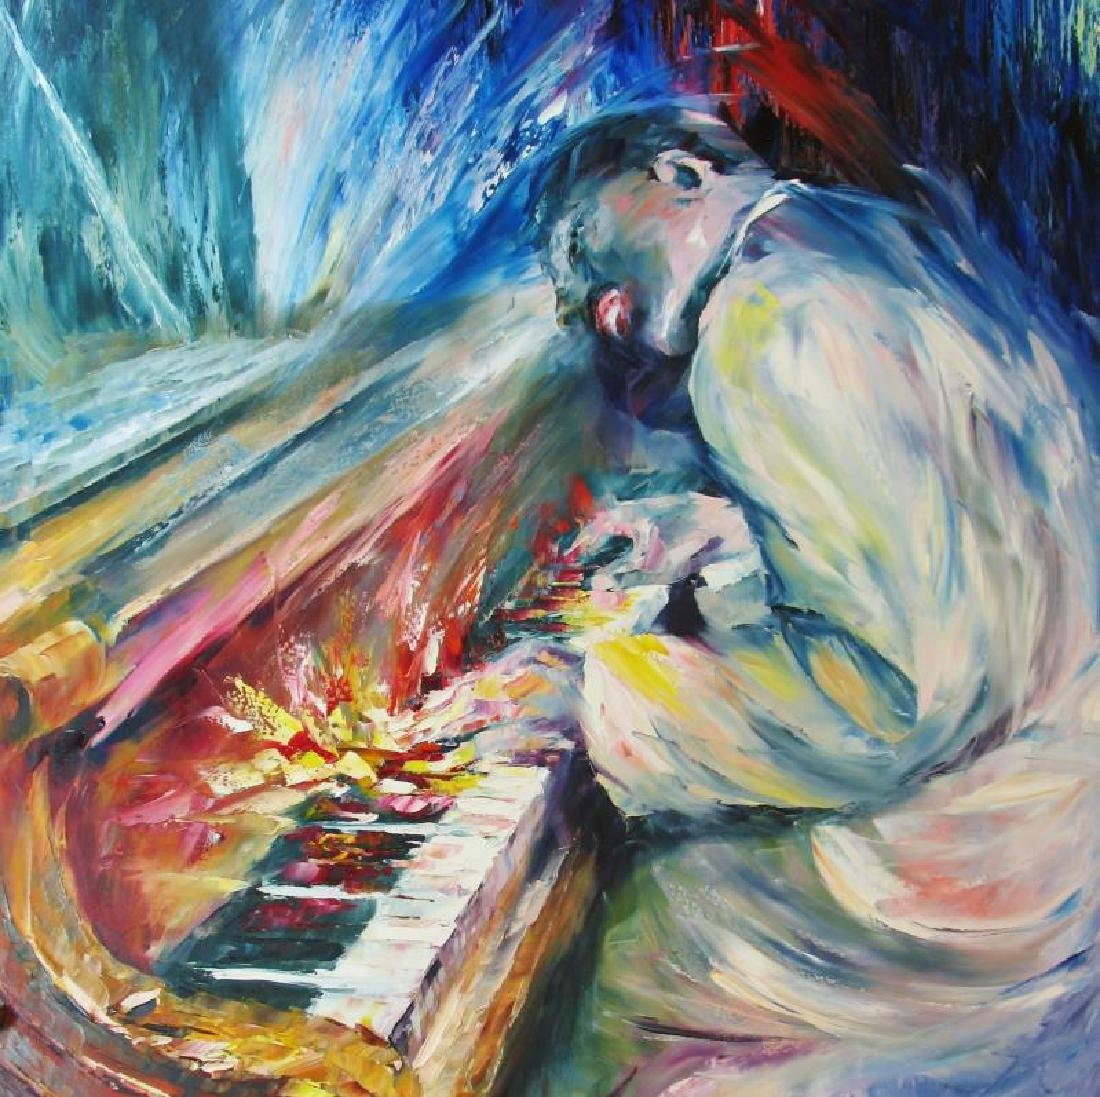 Errol Garner Painting On Canvas Piano Abstract Original - 4